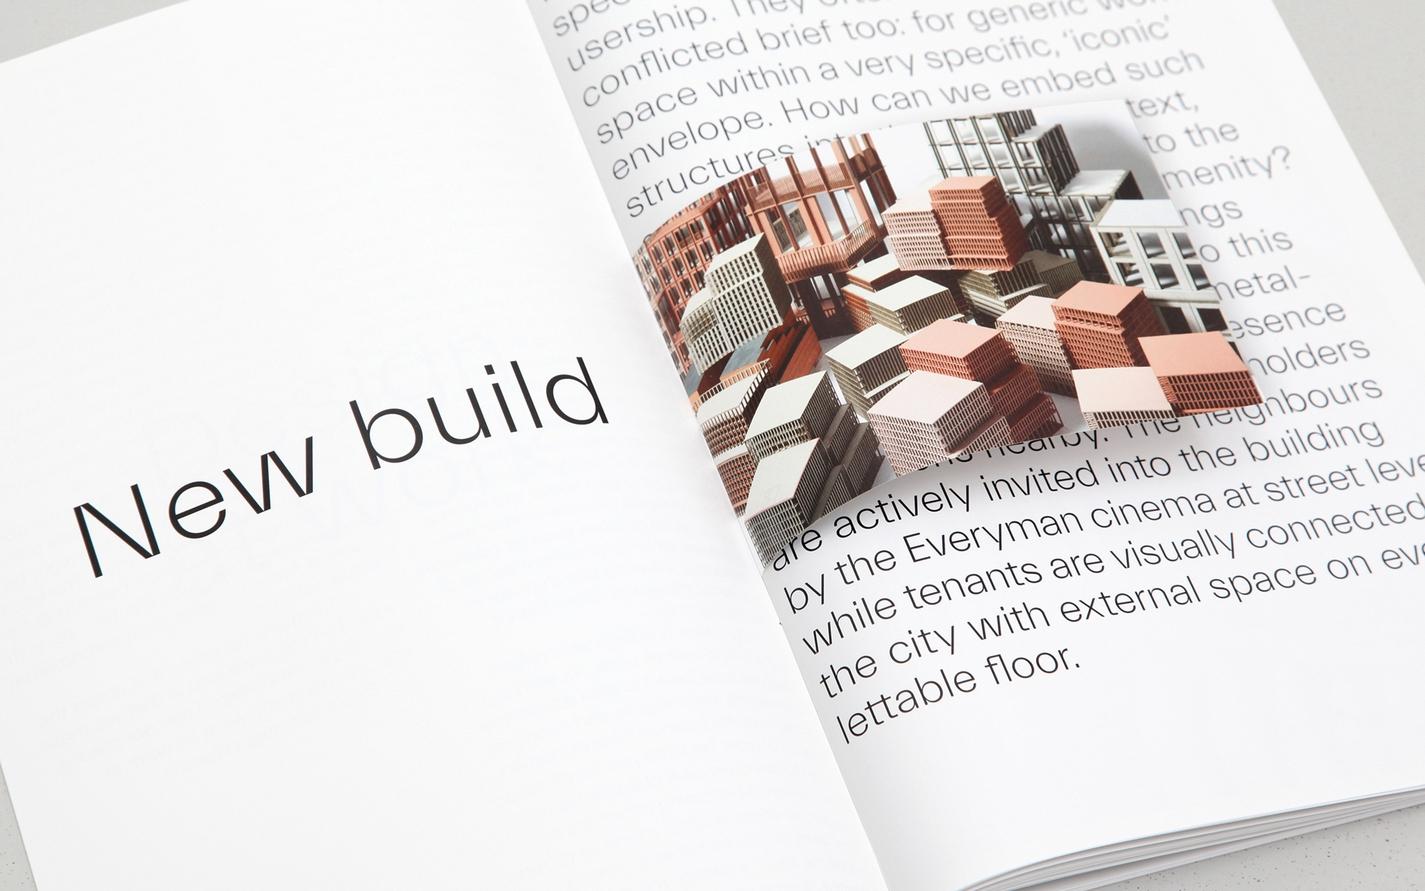 bob-design-morriscompany-brochure6-94097.jpg